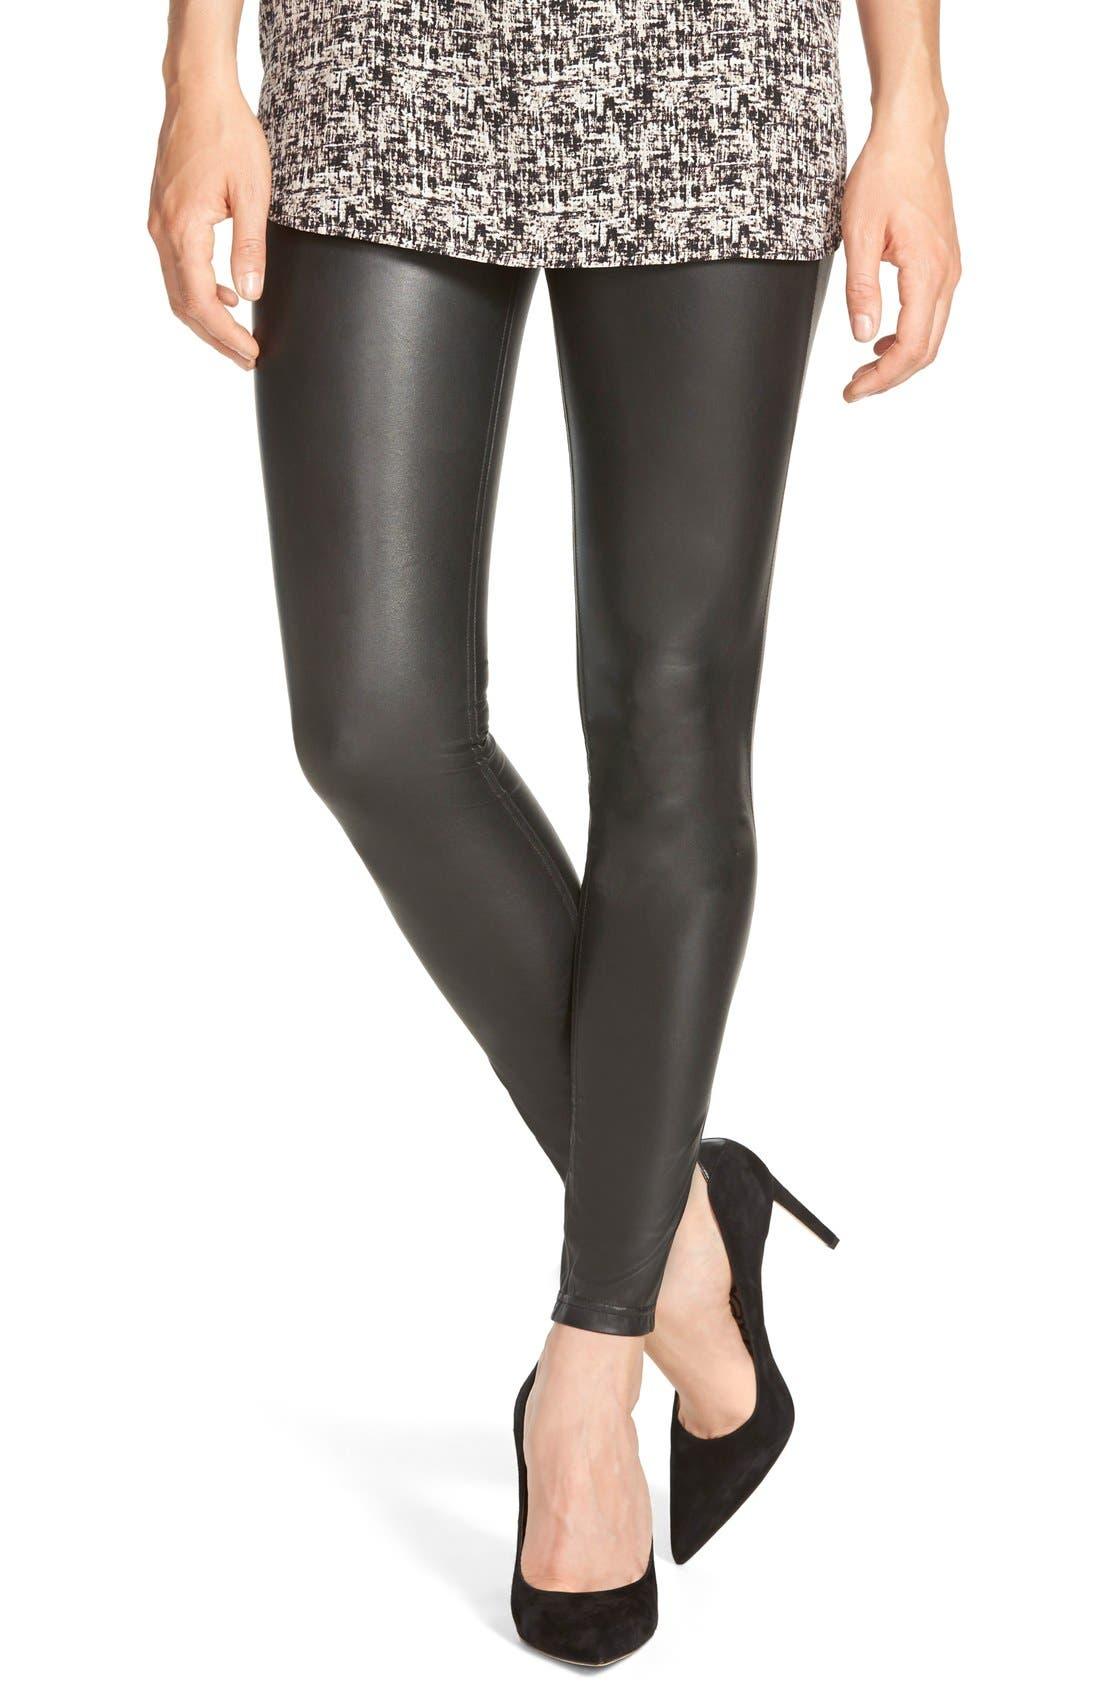 Alternate Image 1 Selected - Hue Faux Leather Leggings